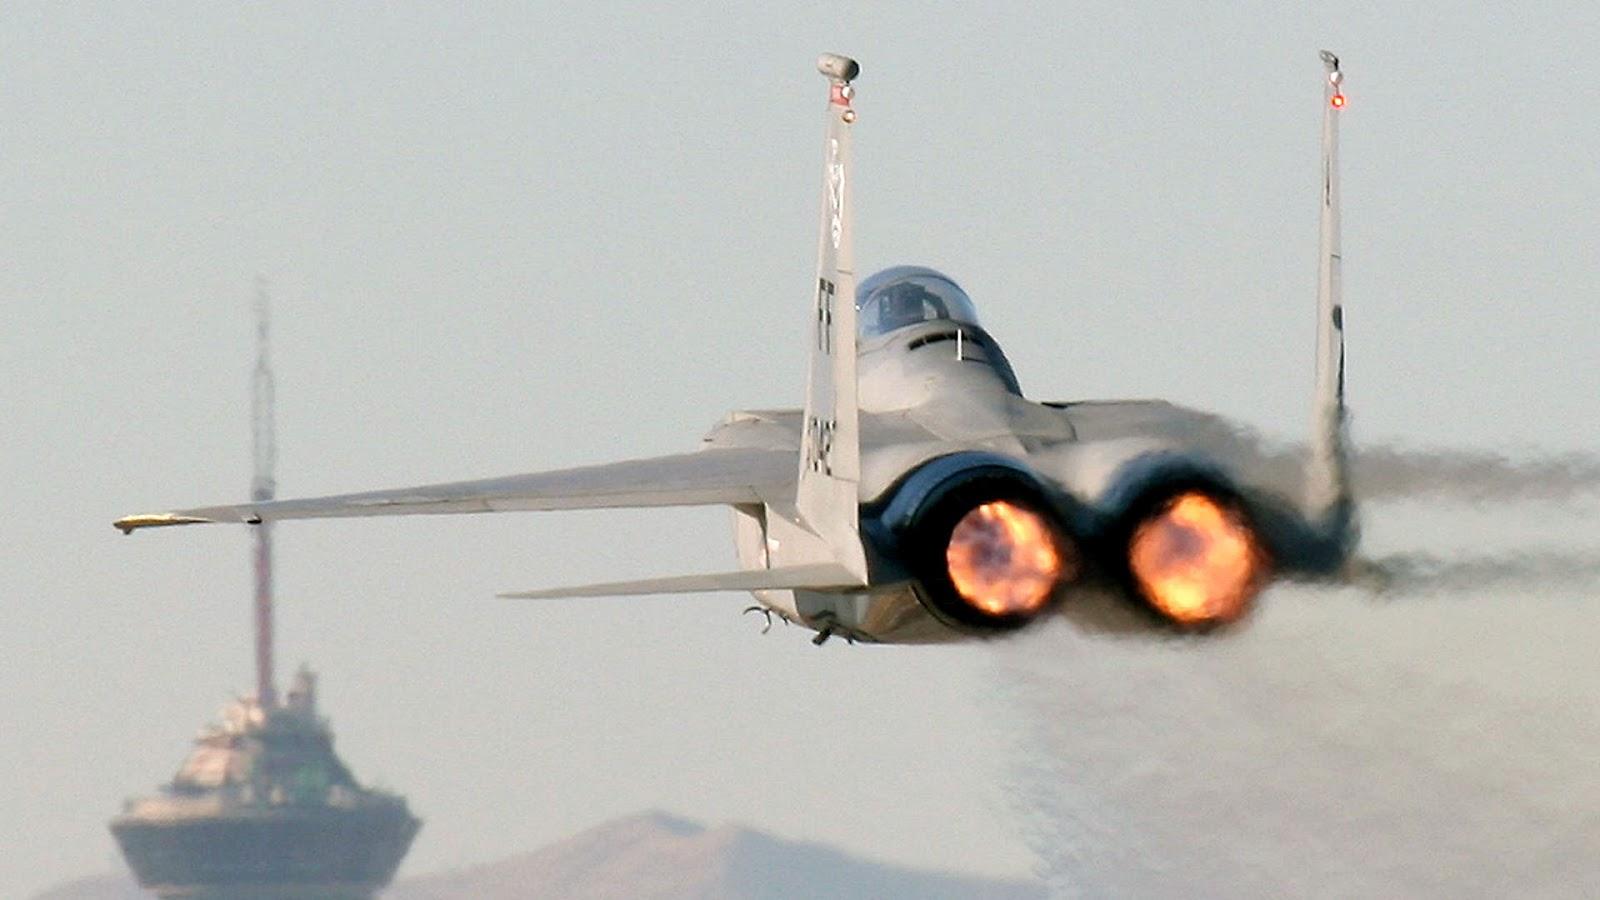 HD WALLPAPER: Aircraft HD Wallpapers,images